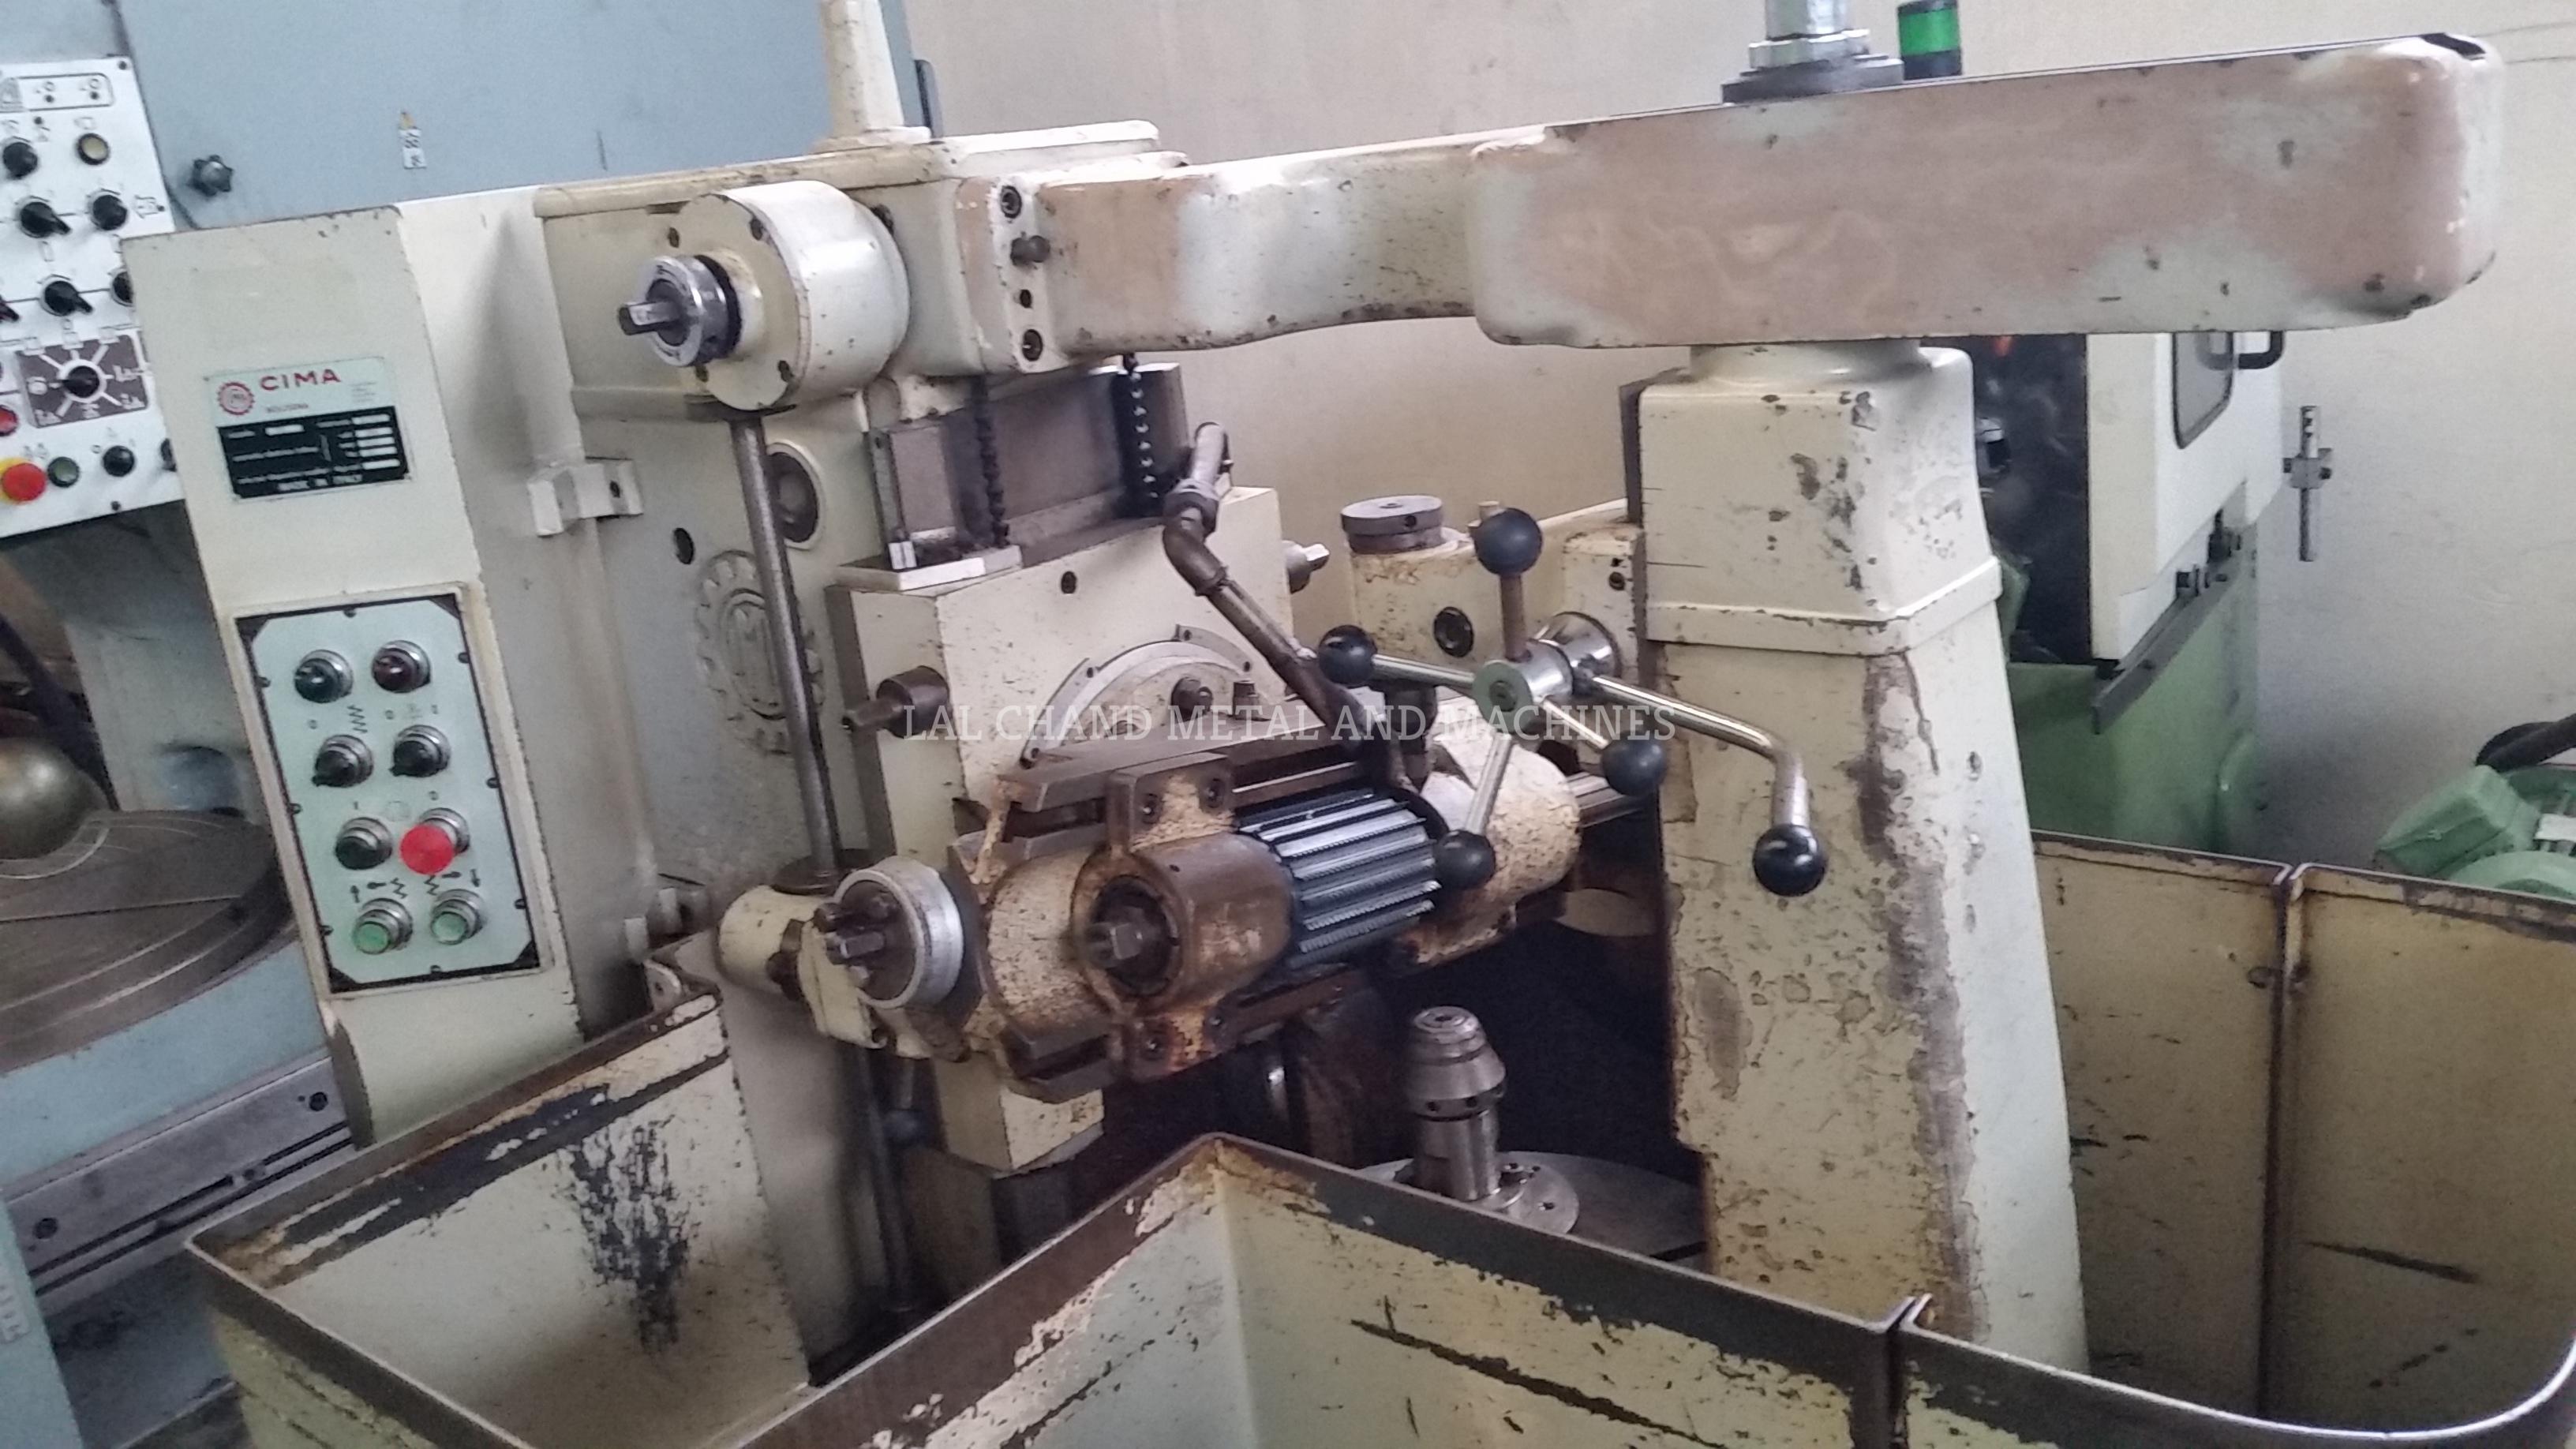 CIMA Gear Hobbing Machine